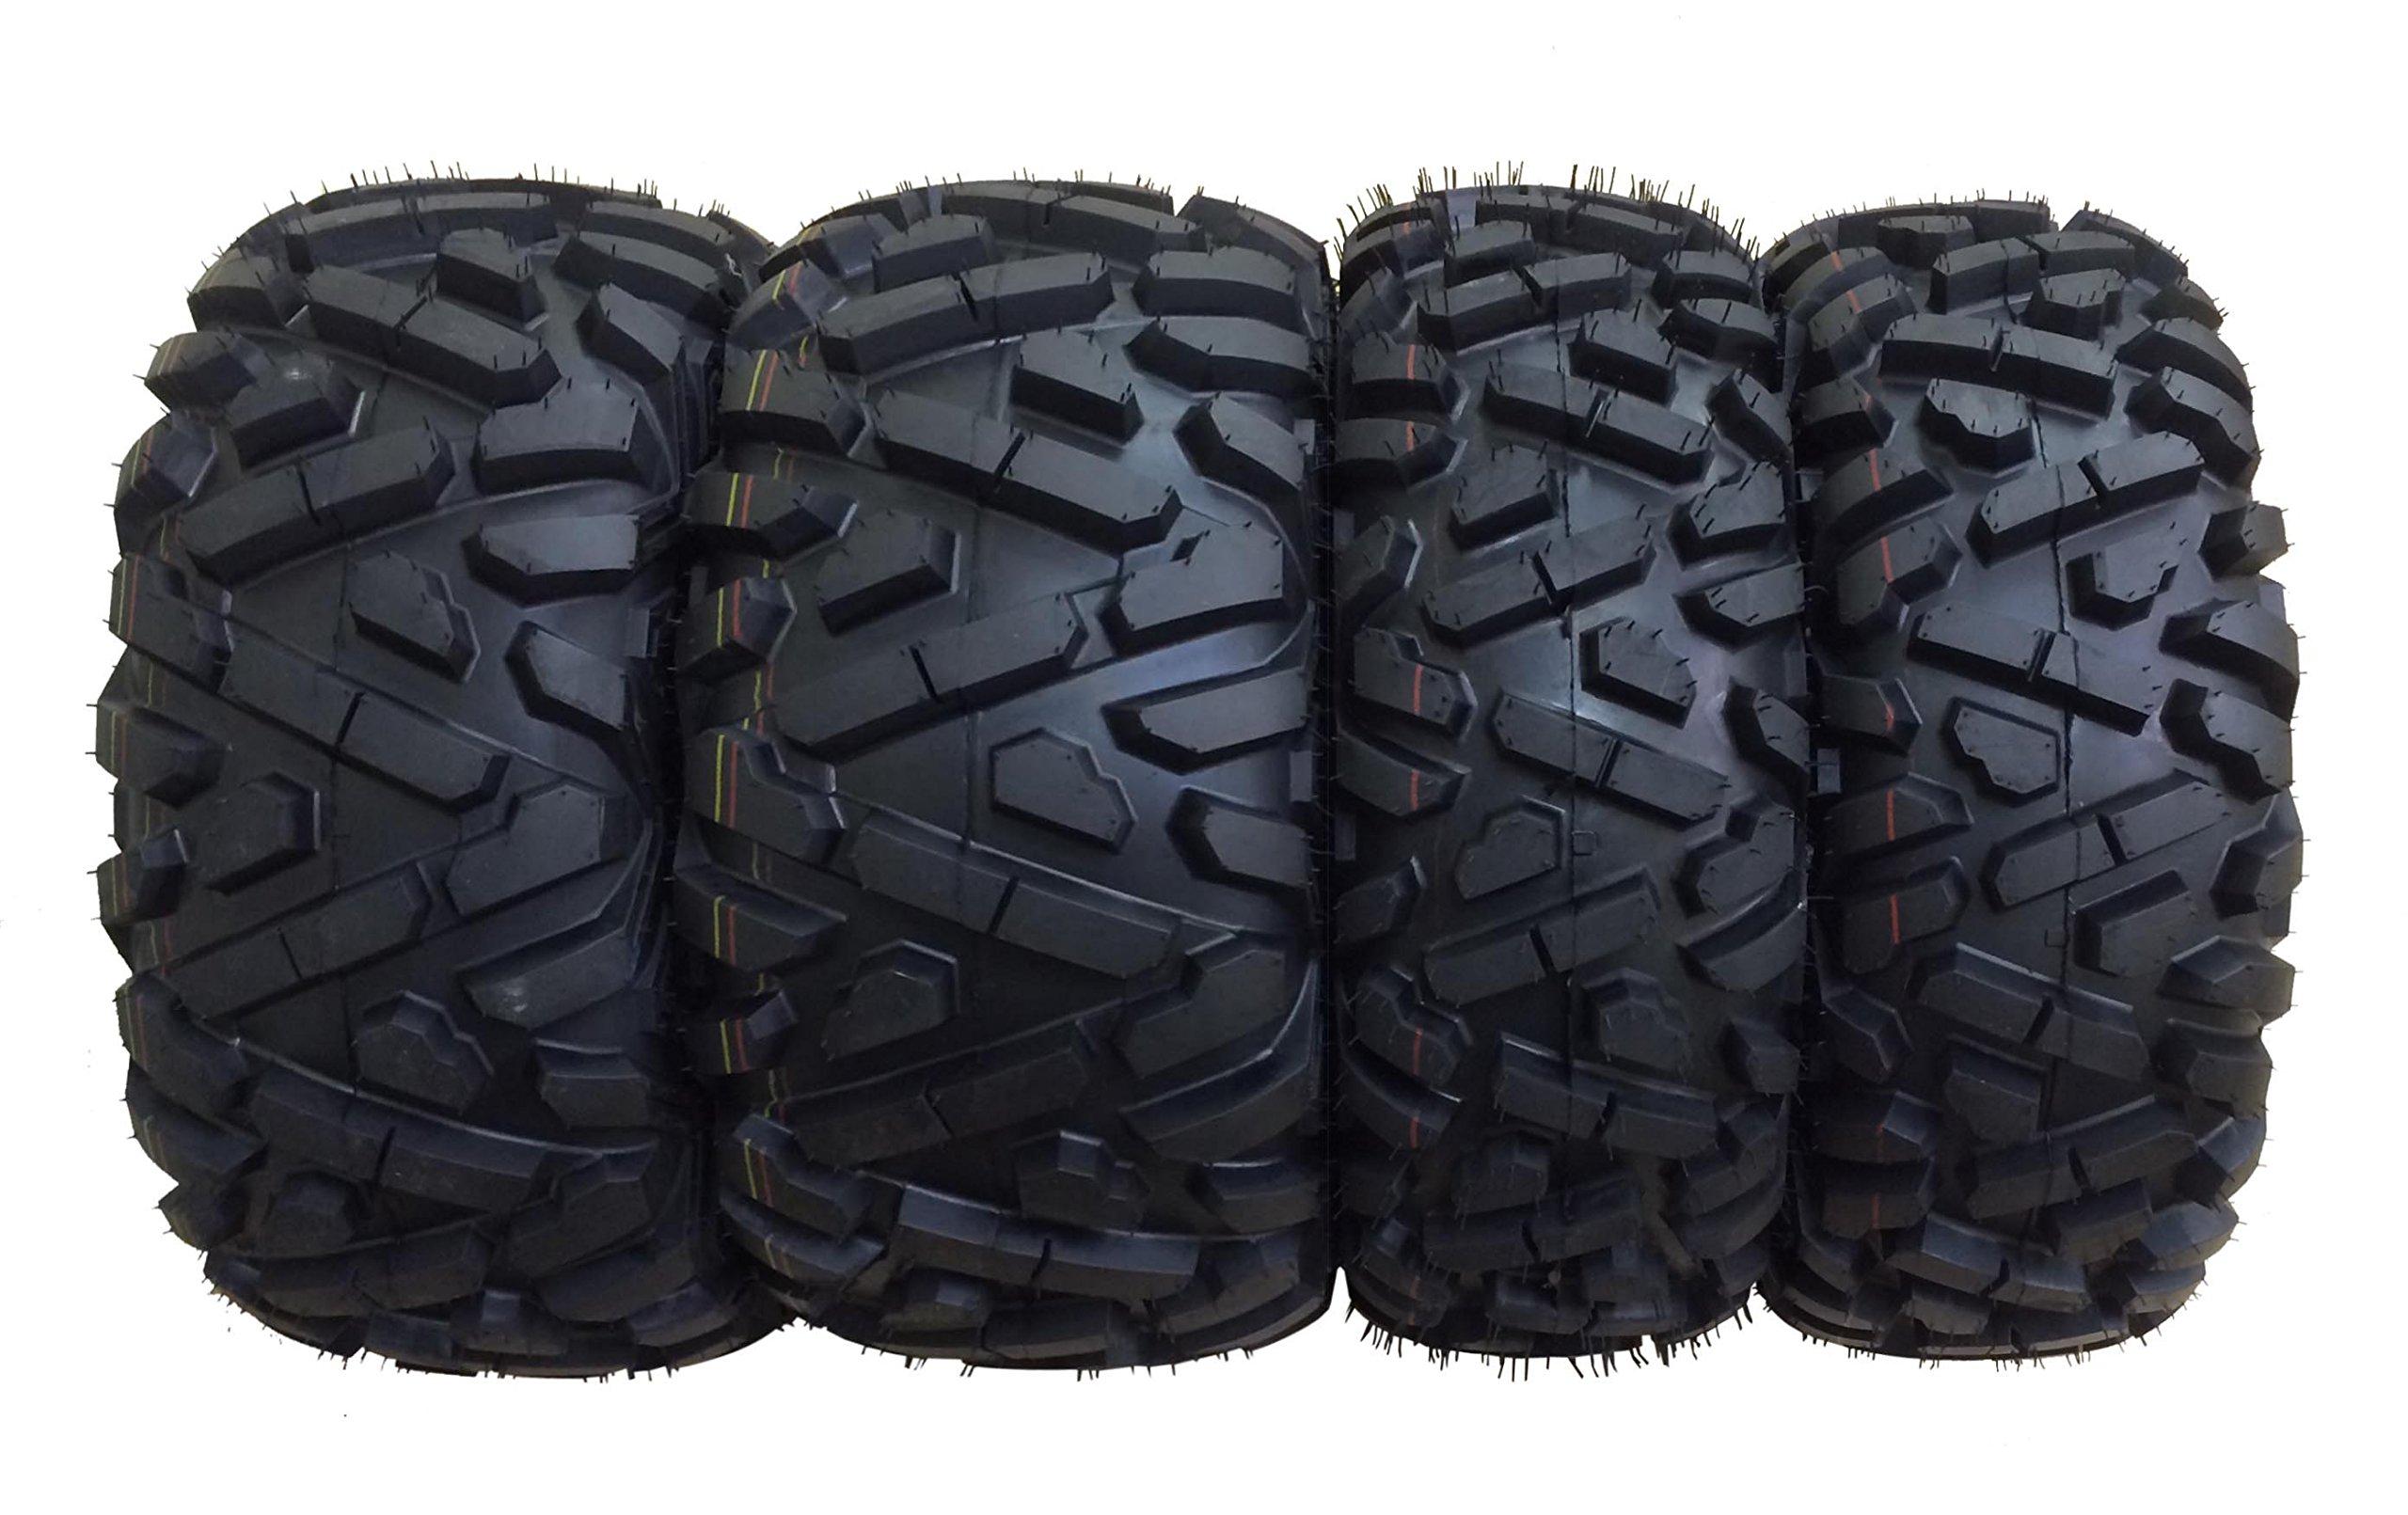 Set of 4 WANDA ATV Tires AT 26x9-12 Front & 26x11-12 Rear /6PR P350 - 10166/10168 …